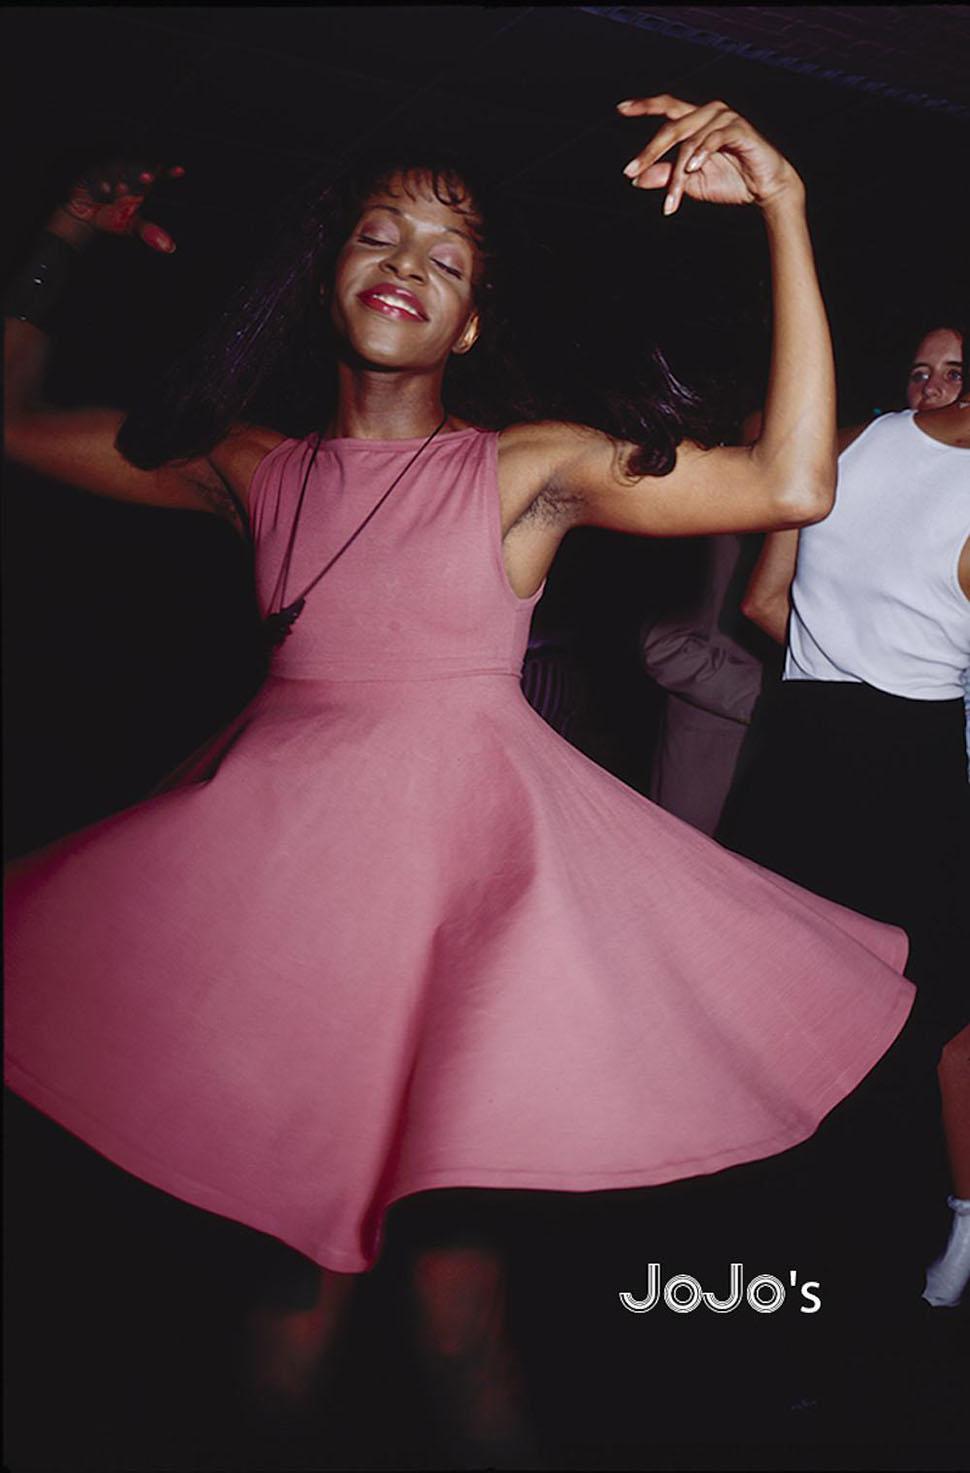 Ночная жизнь британцев в 80-90-х годах от клубного фотографа Адама Фридмана